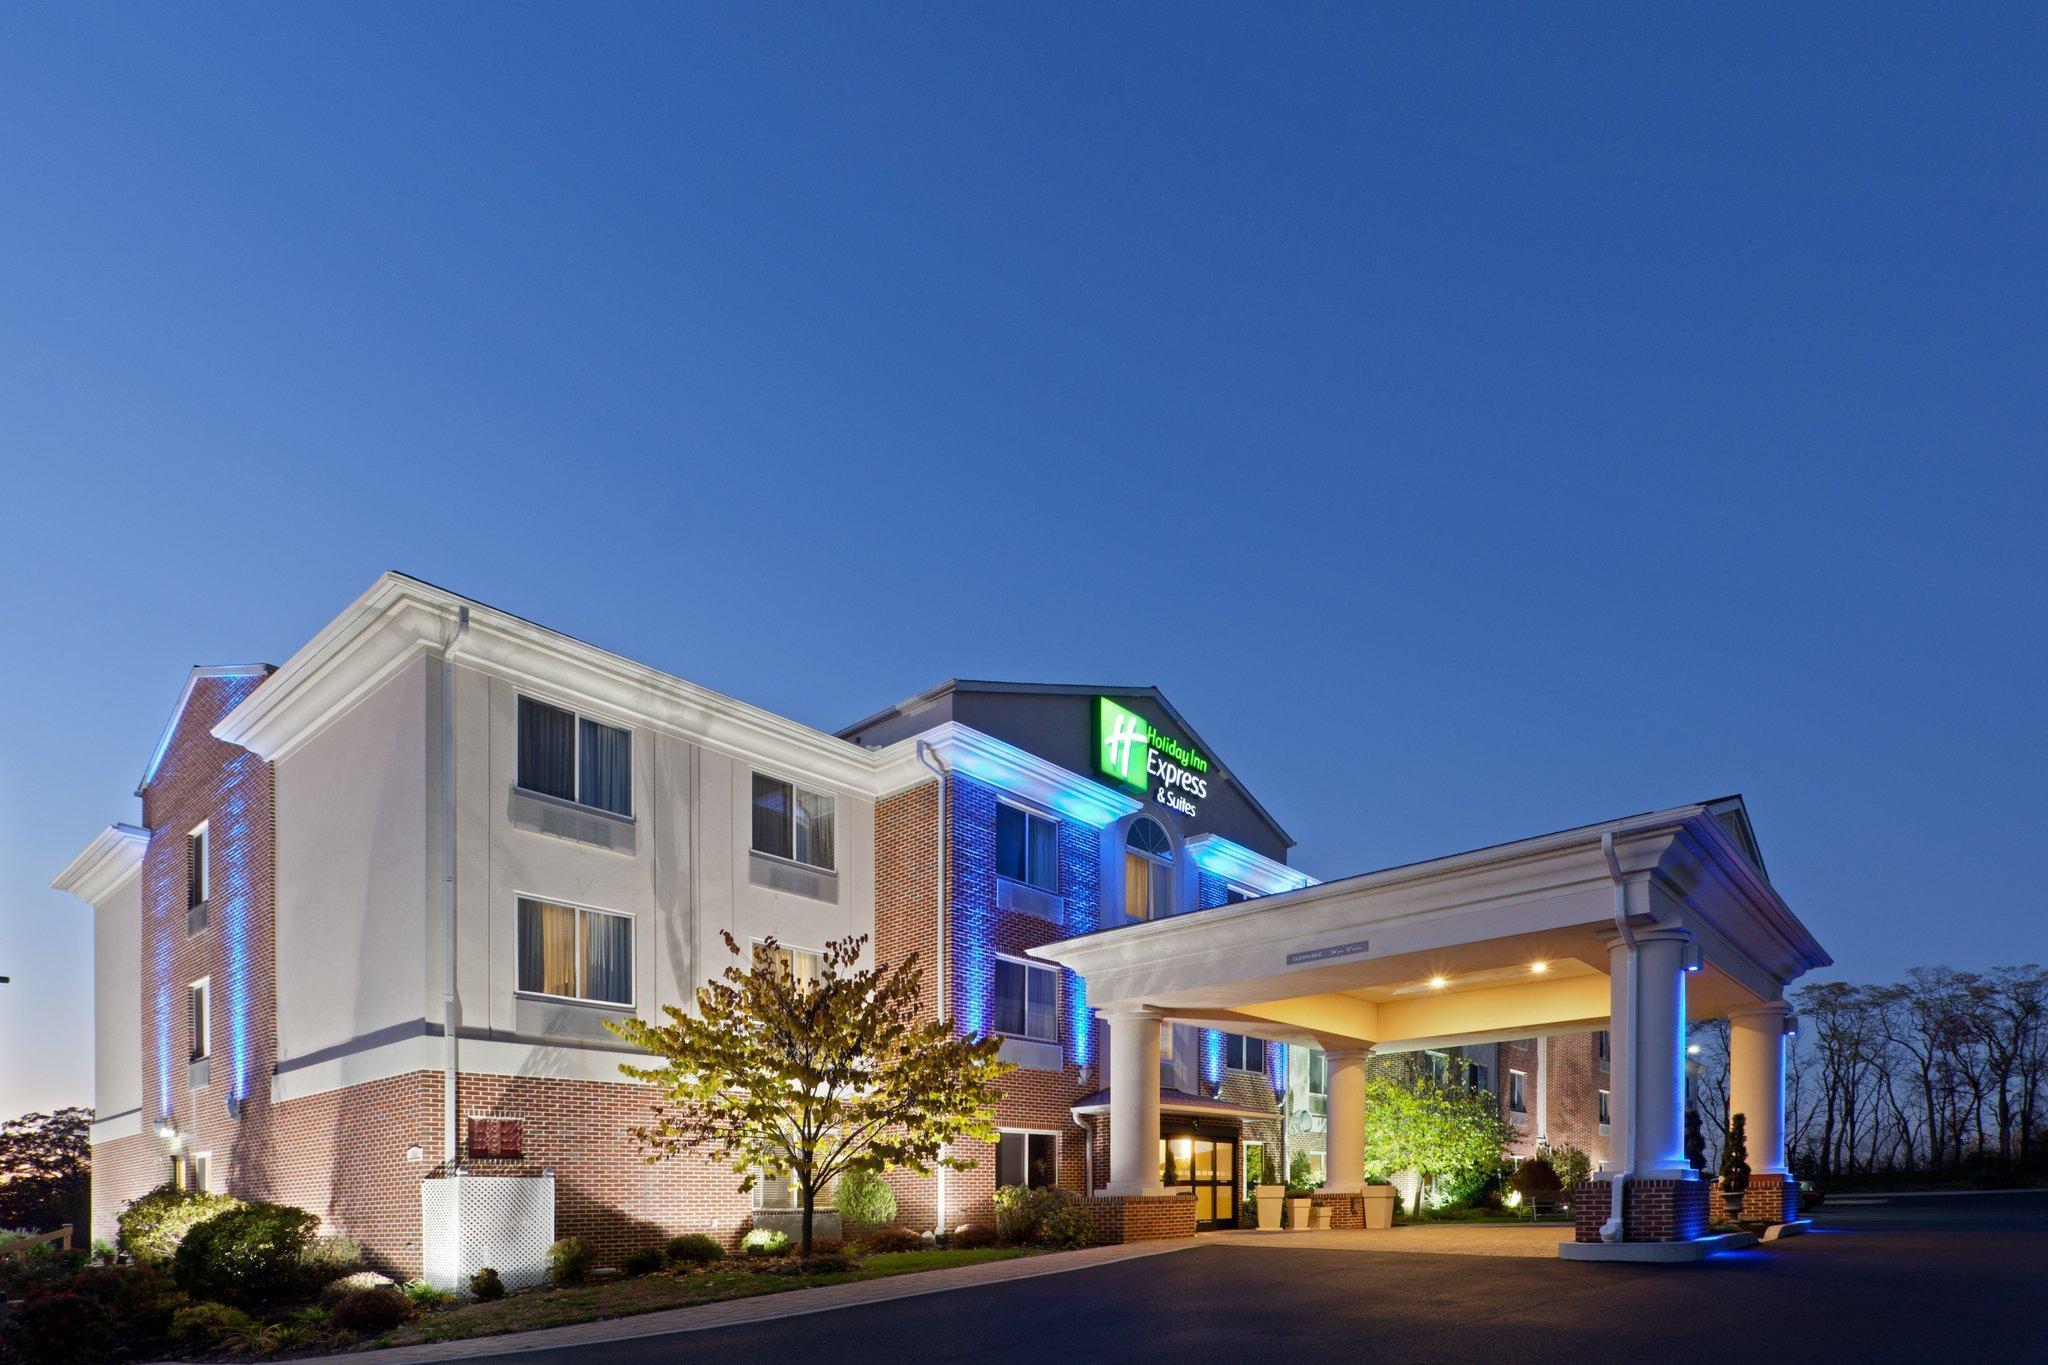 Holiday Inn Express Hotel & Suites Lancaster Lititz